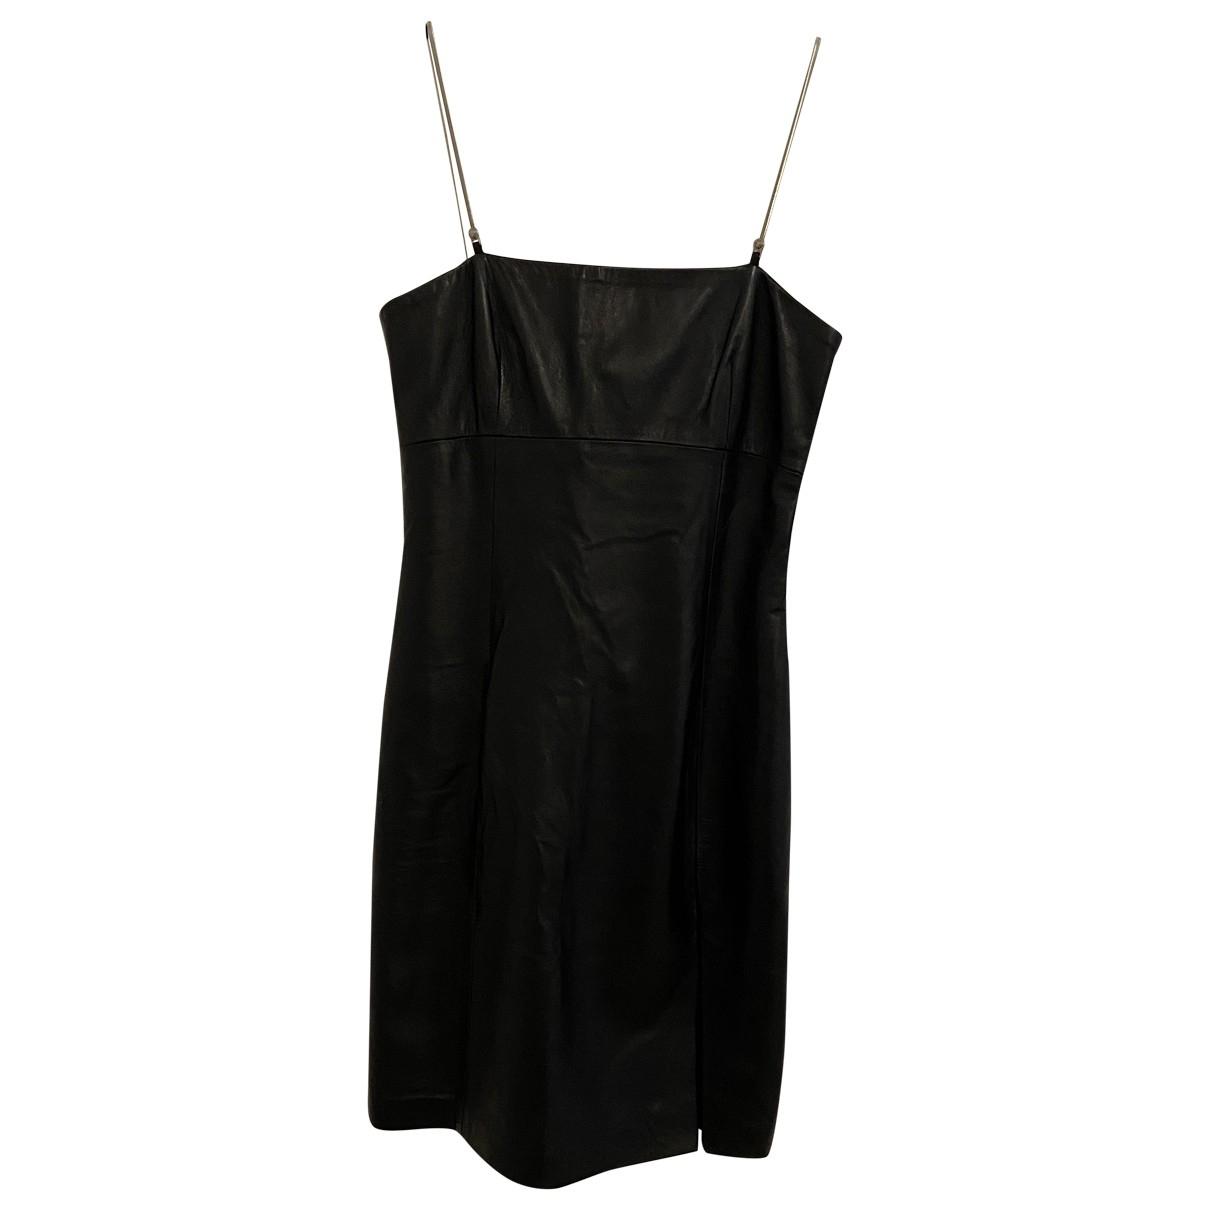 Versace Jeans \N Black Leather dress for Women 42 IT